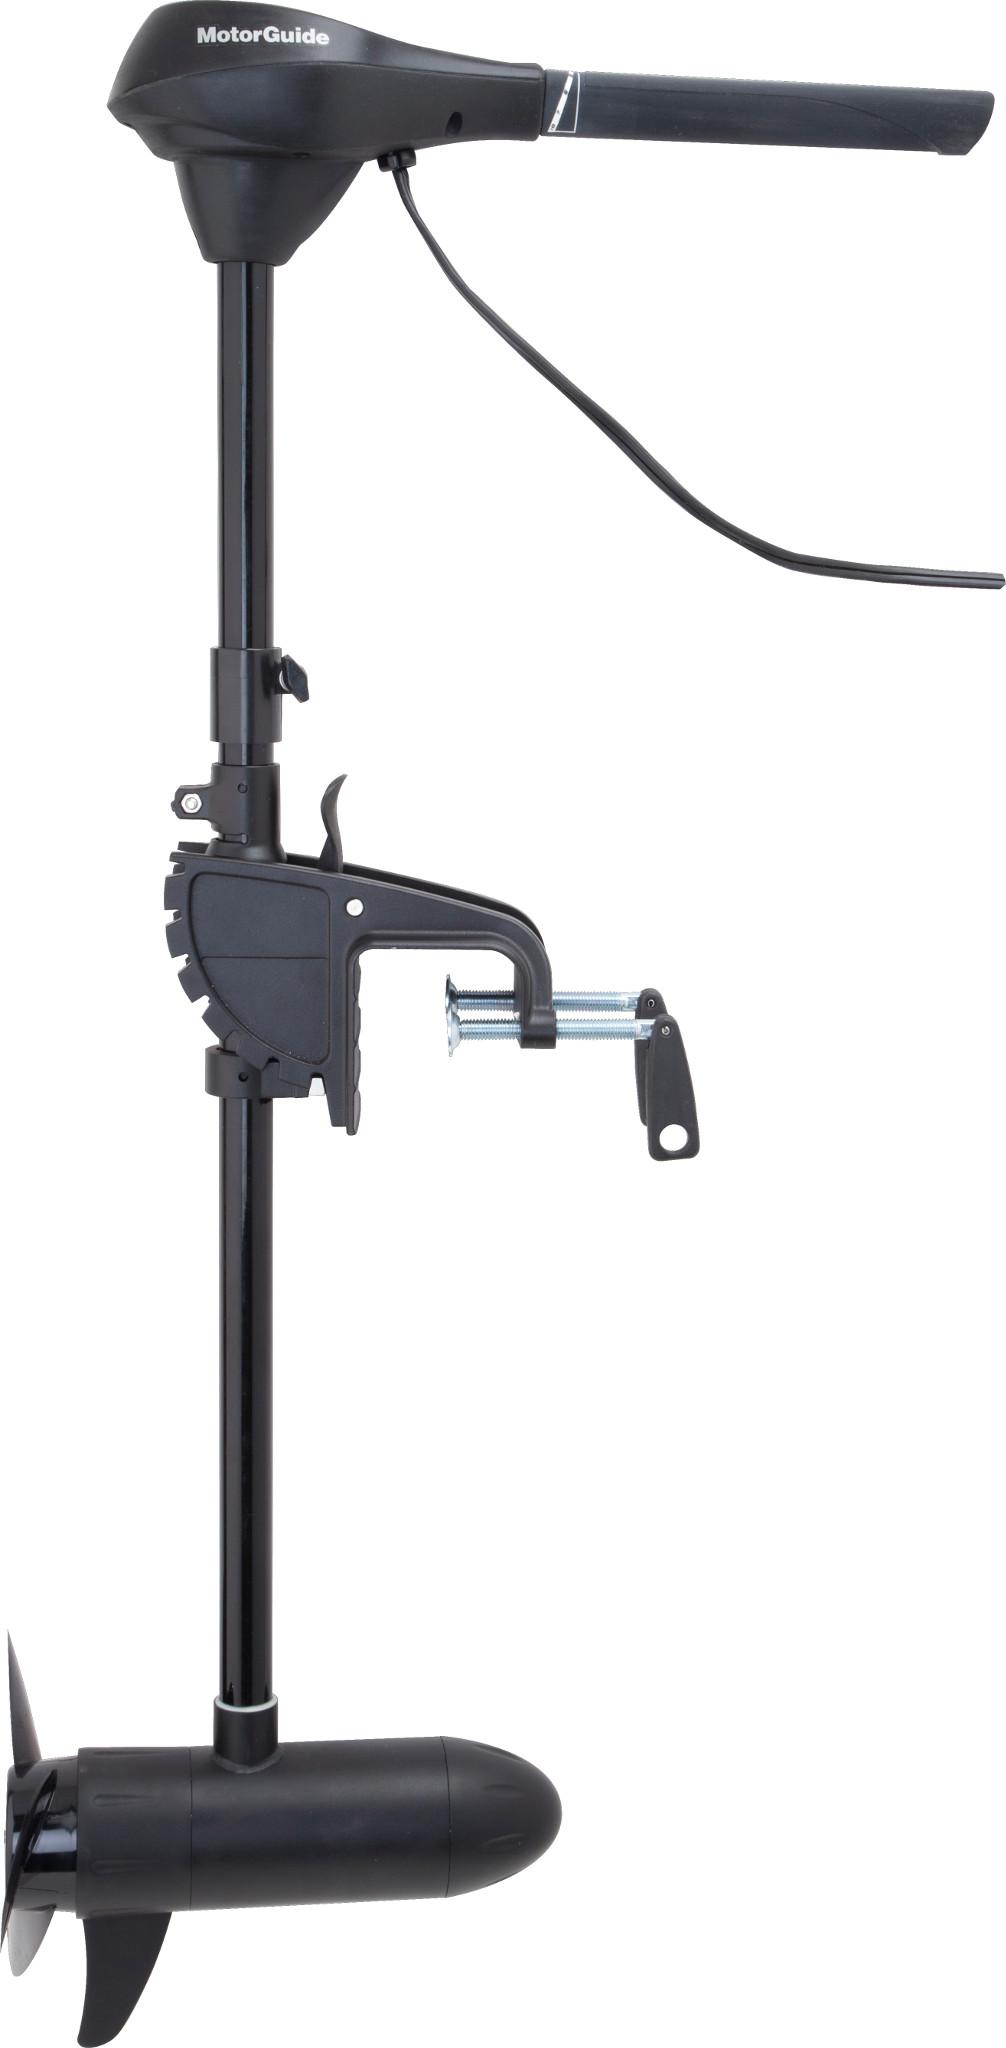 MotorGuide R3 - 45 HT 36 DIGITAL VARIABEL  Heckmontage – Bild 1